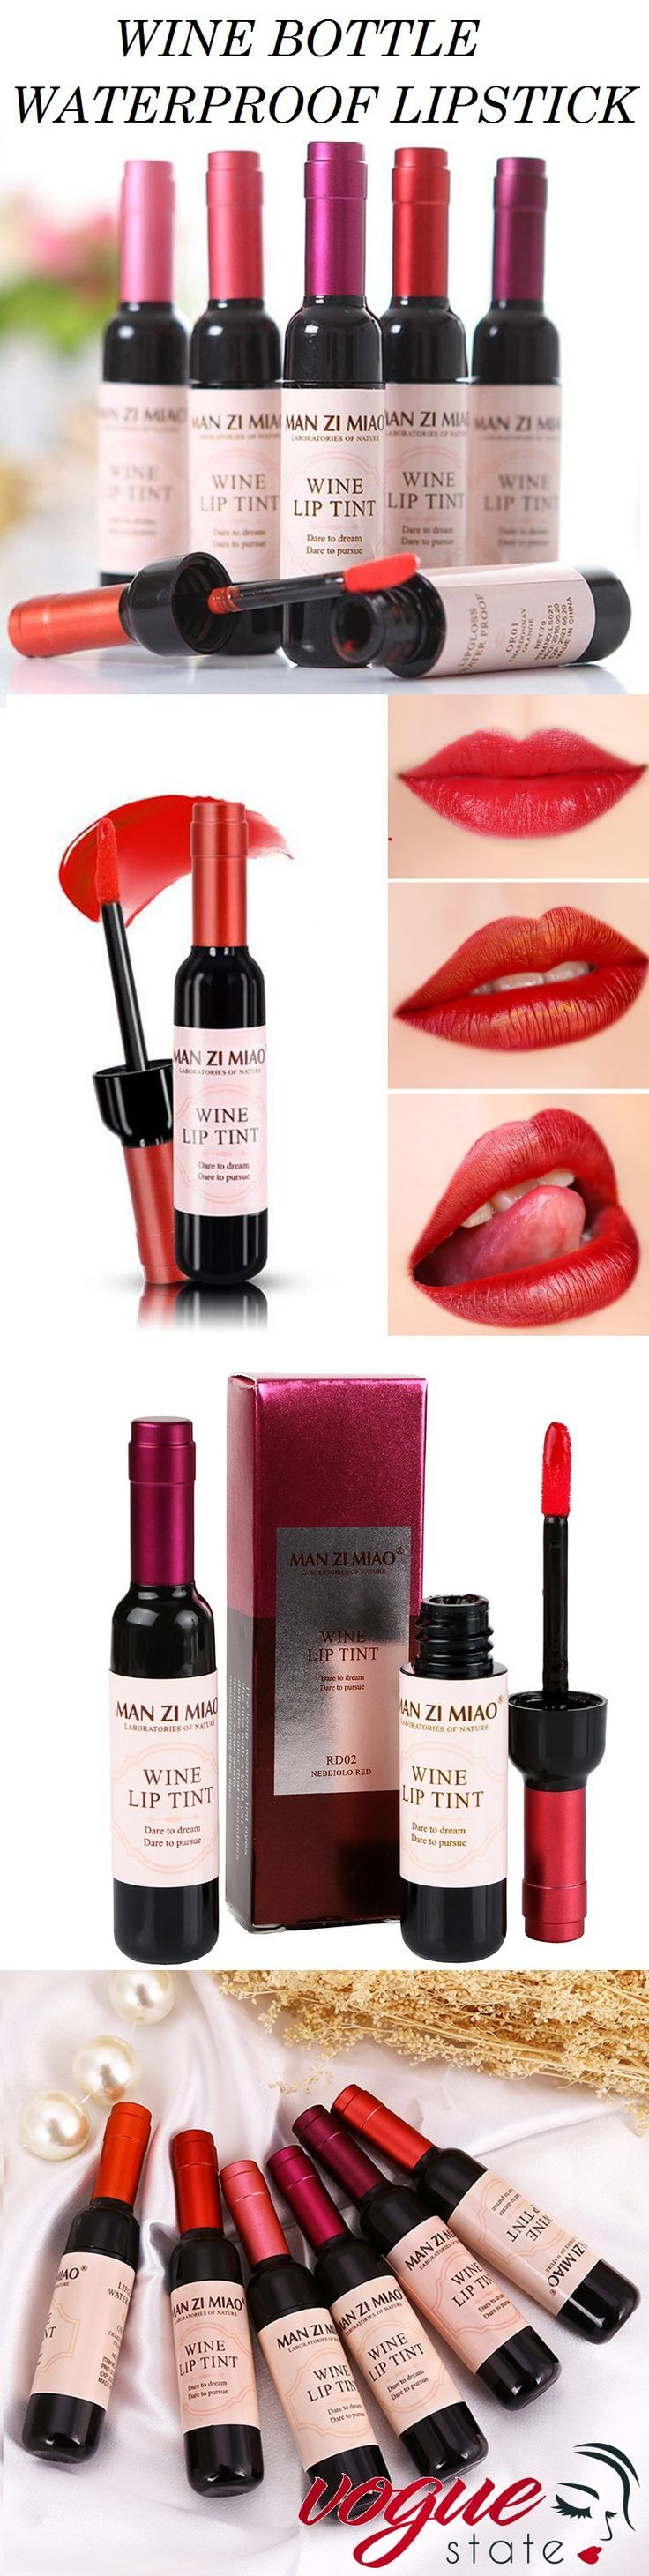 wine bottle liquid lipstick